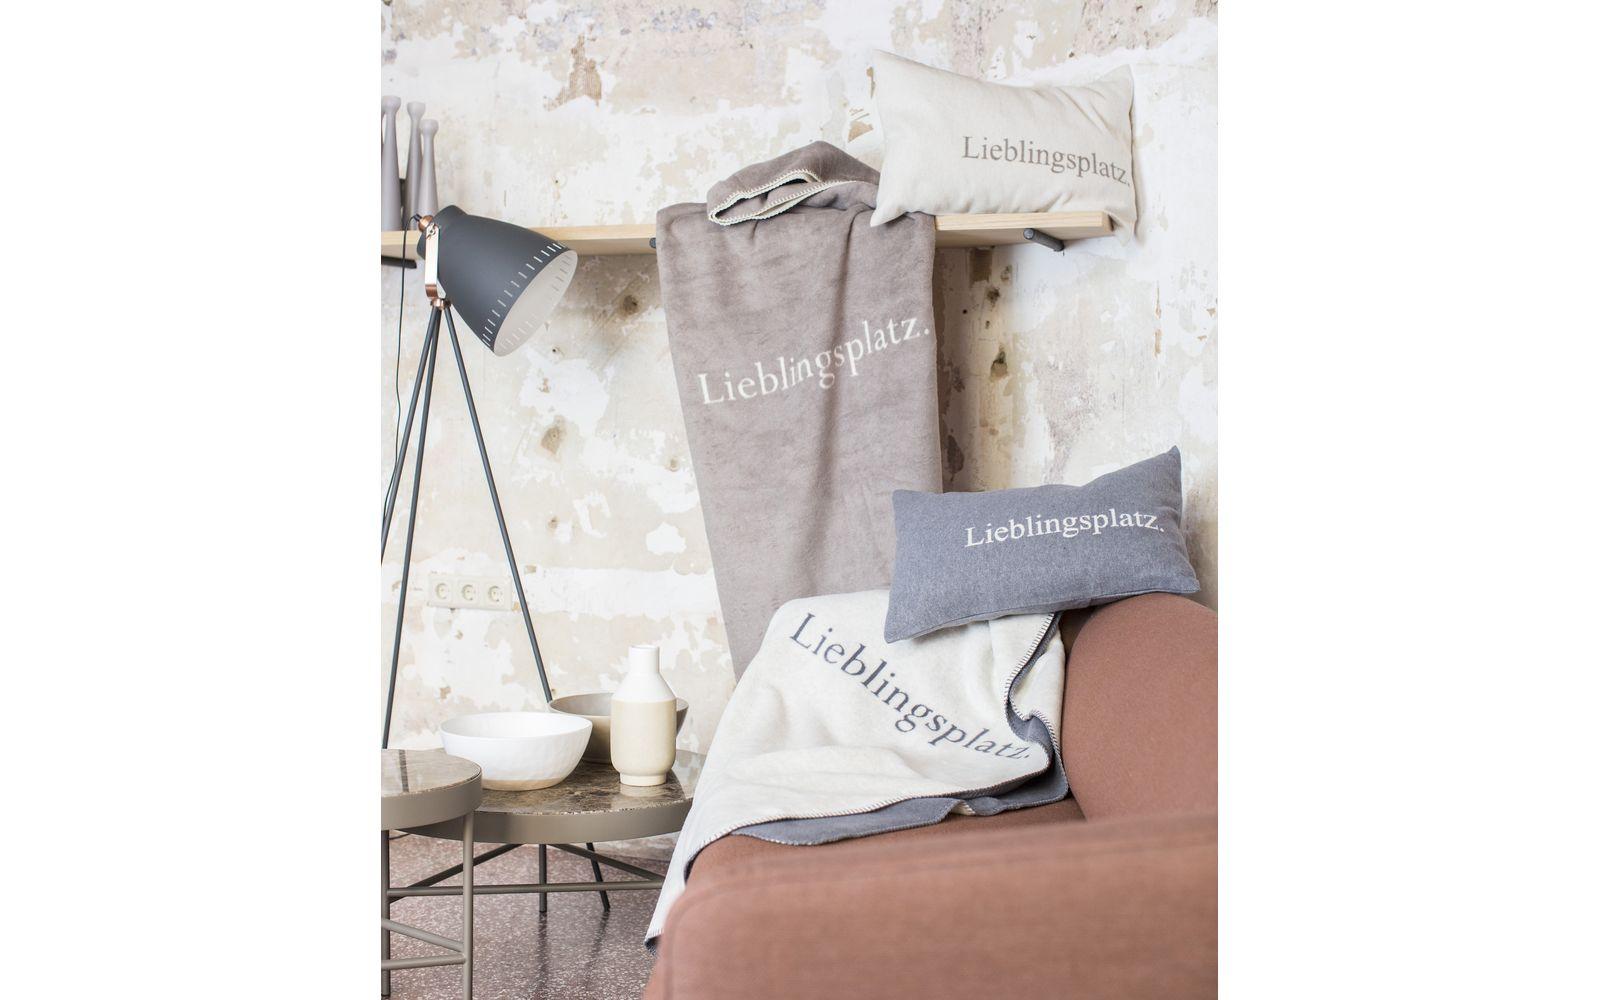 "SILVRETTA cushion cover ""Lieblingsplatz"" (favourite place)"